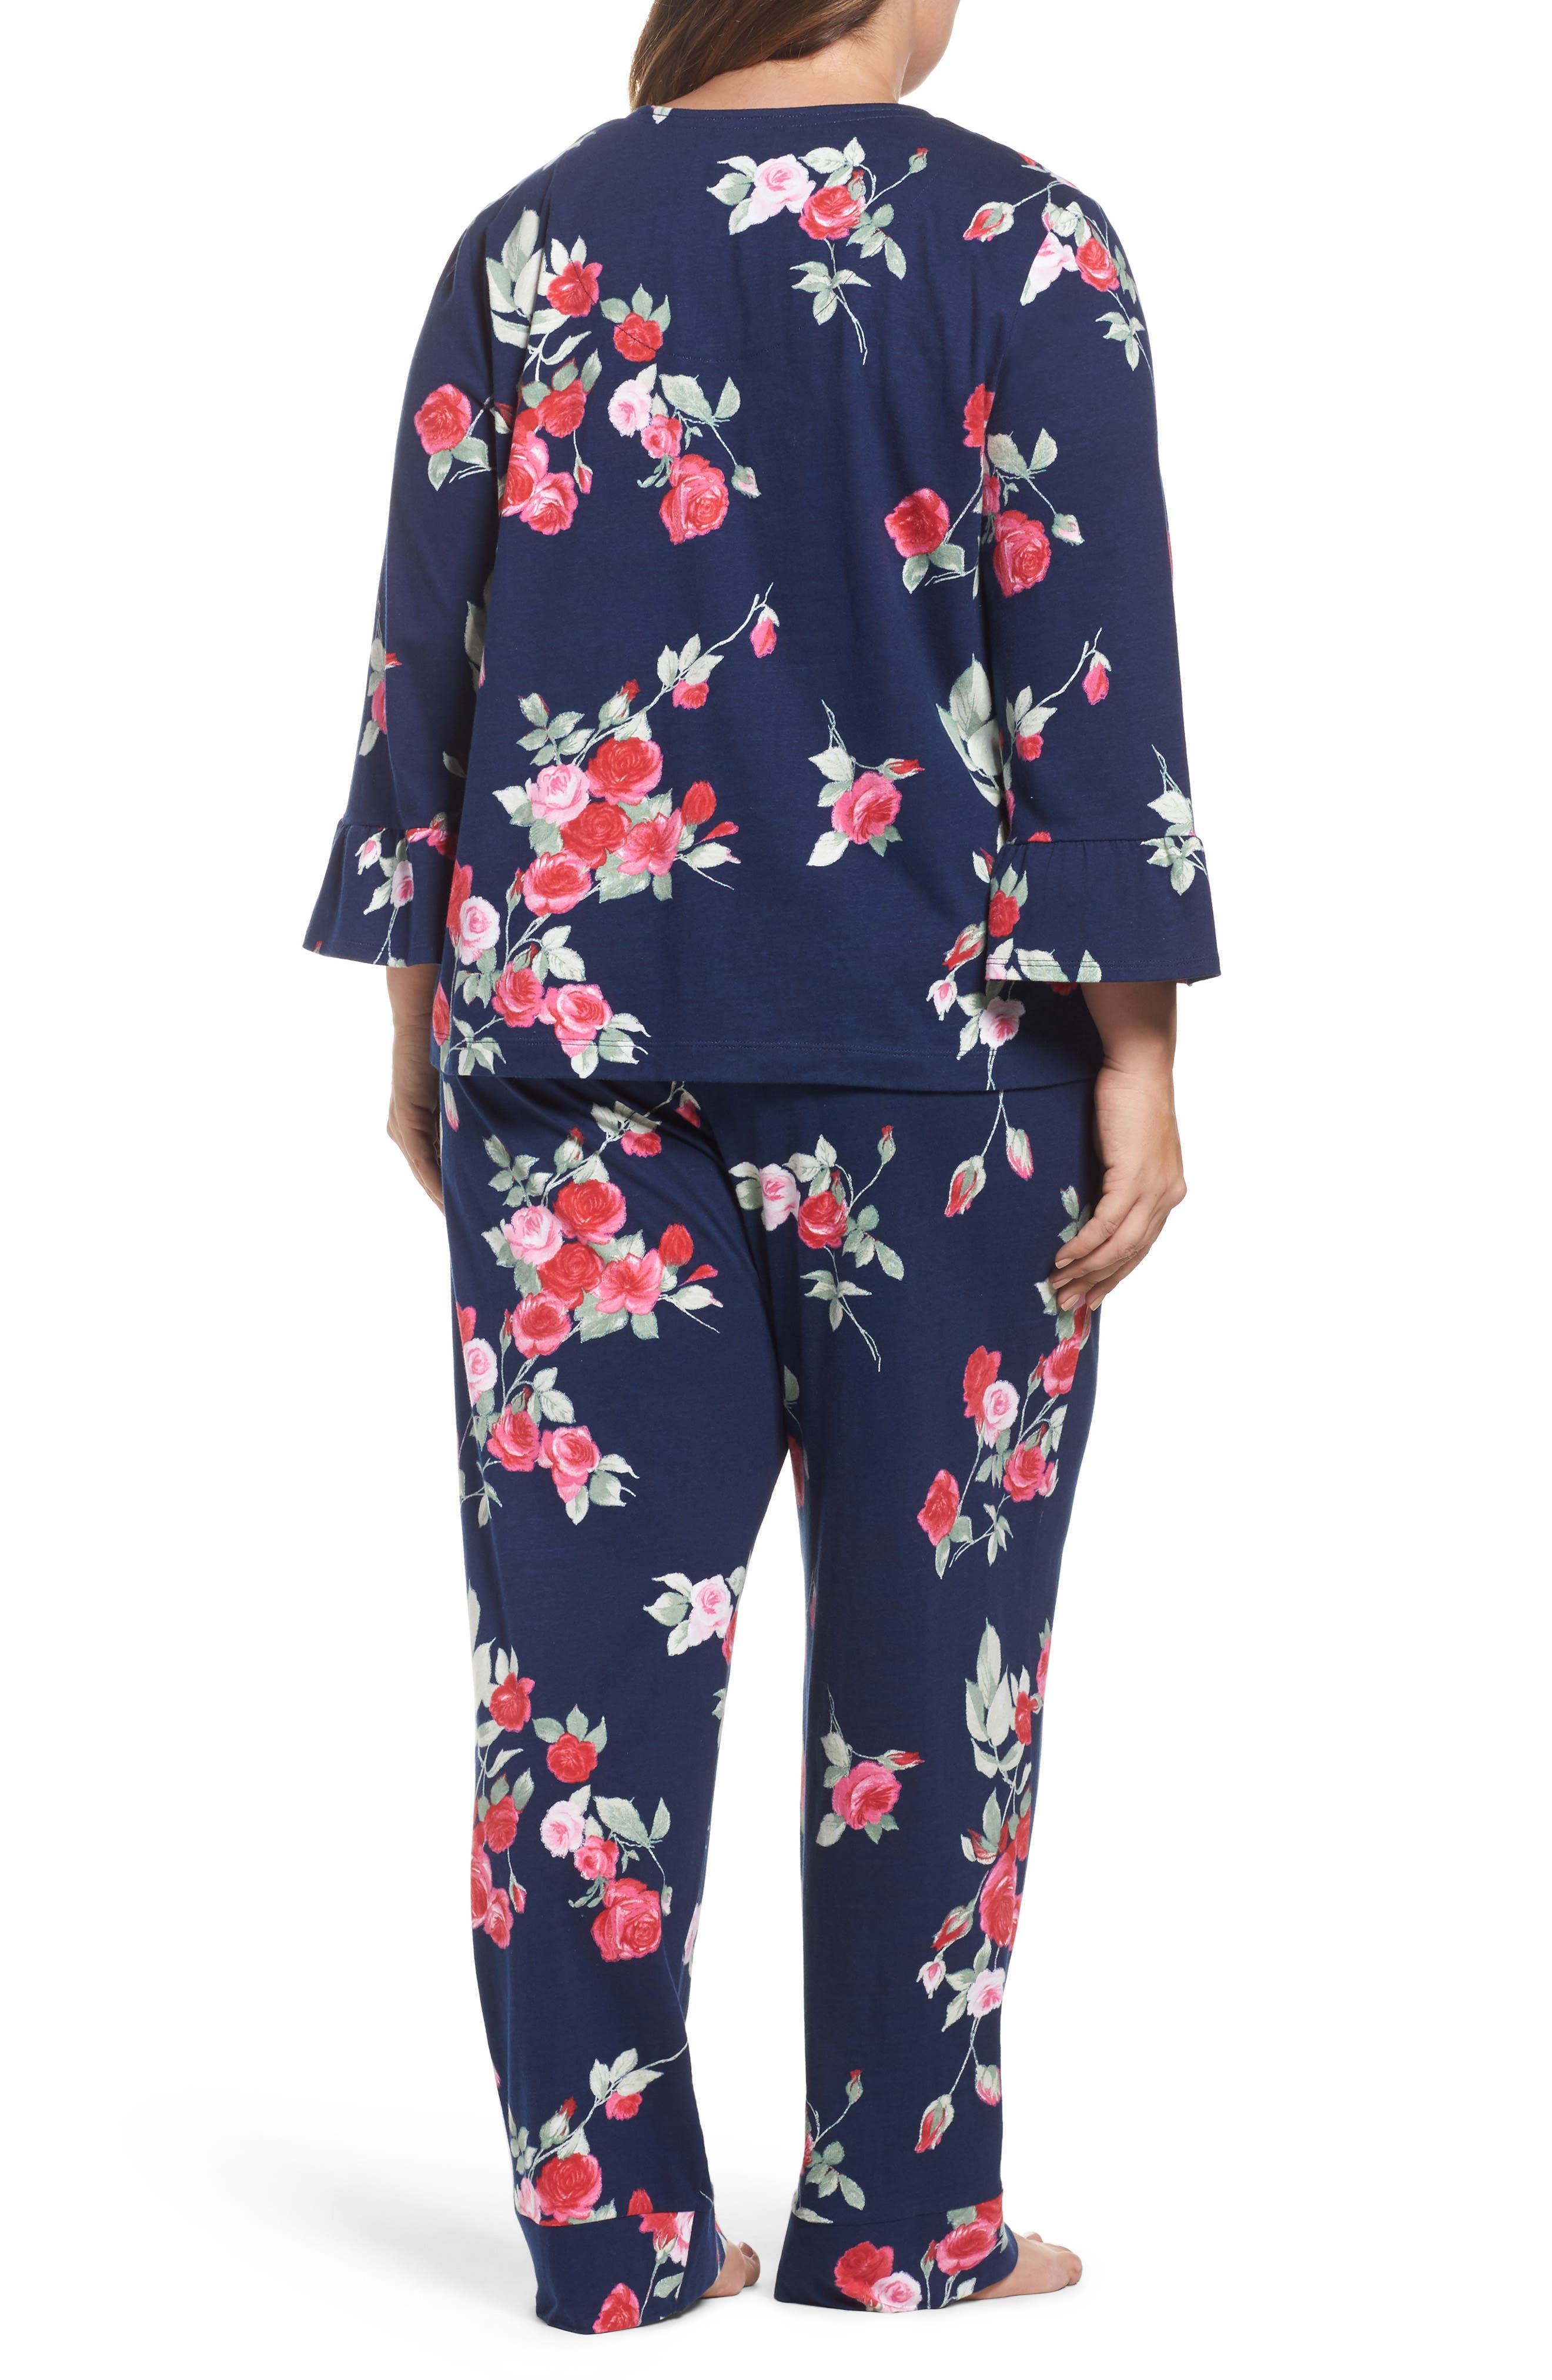 Floral Print Pajamas,                             Alternate thumbnail 2, color,                             490